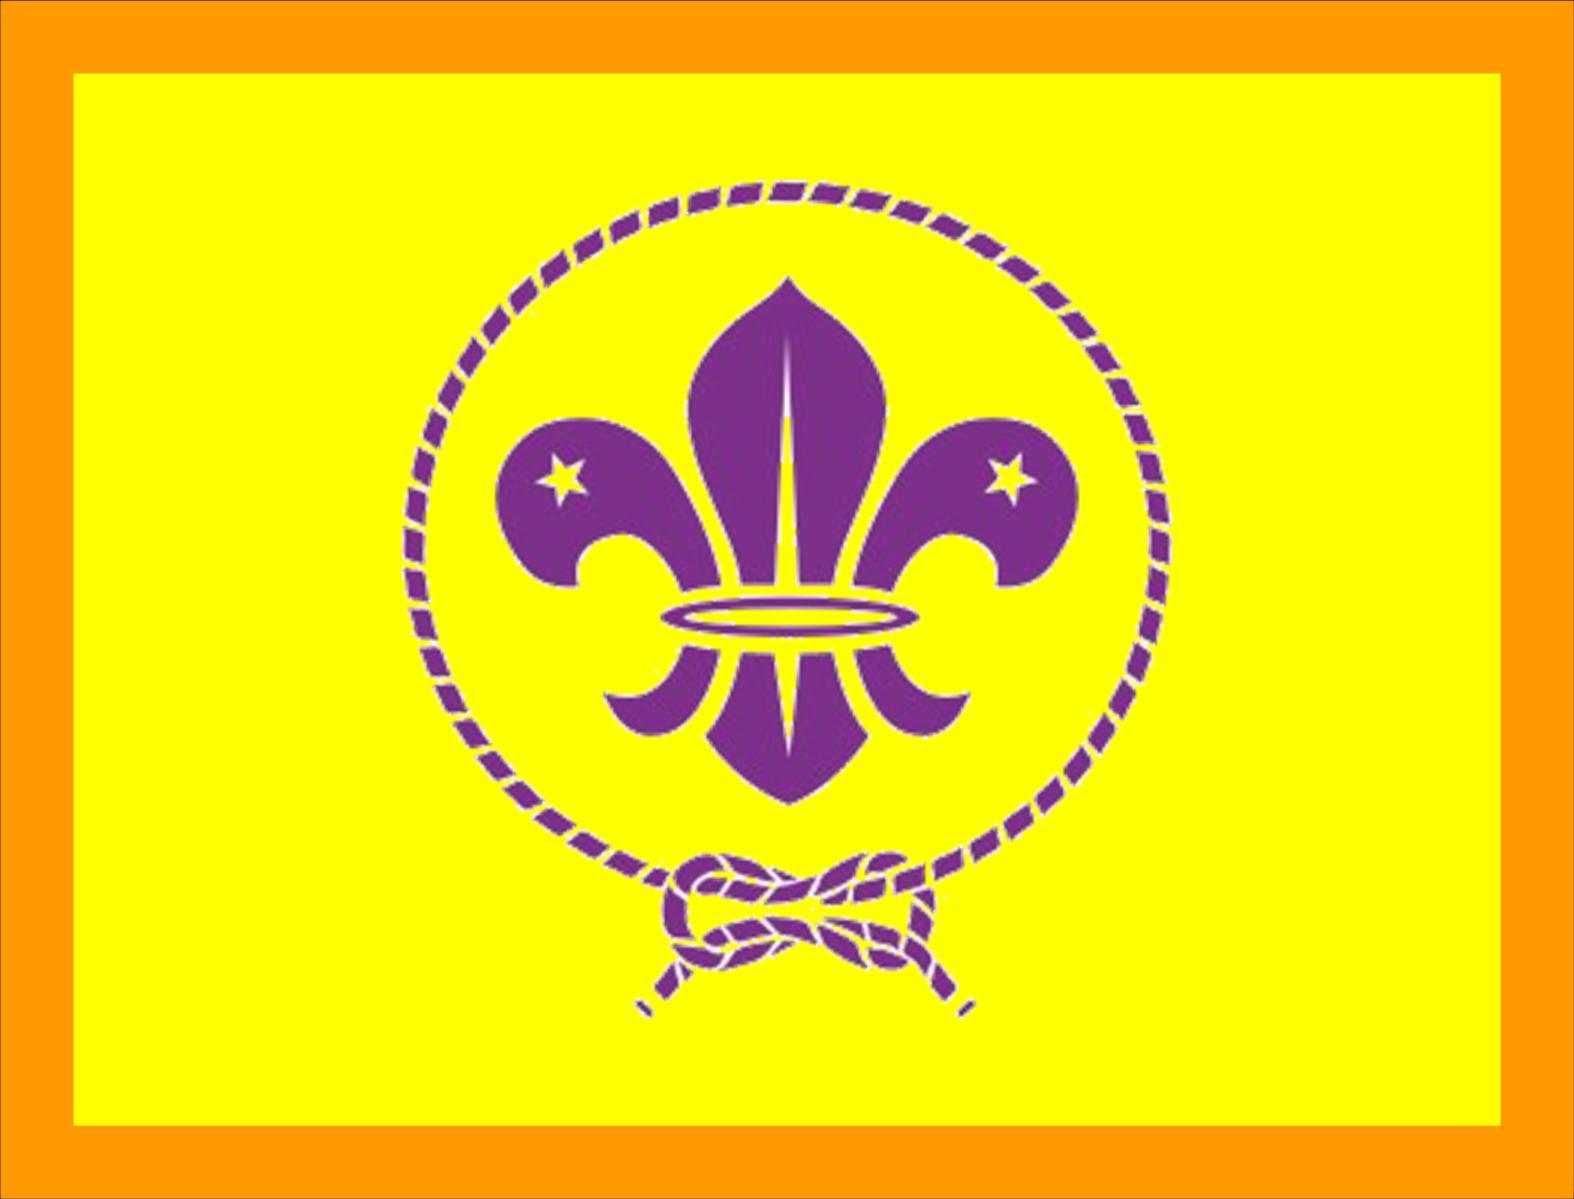 Bandera de Grupo